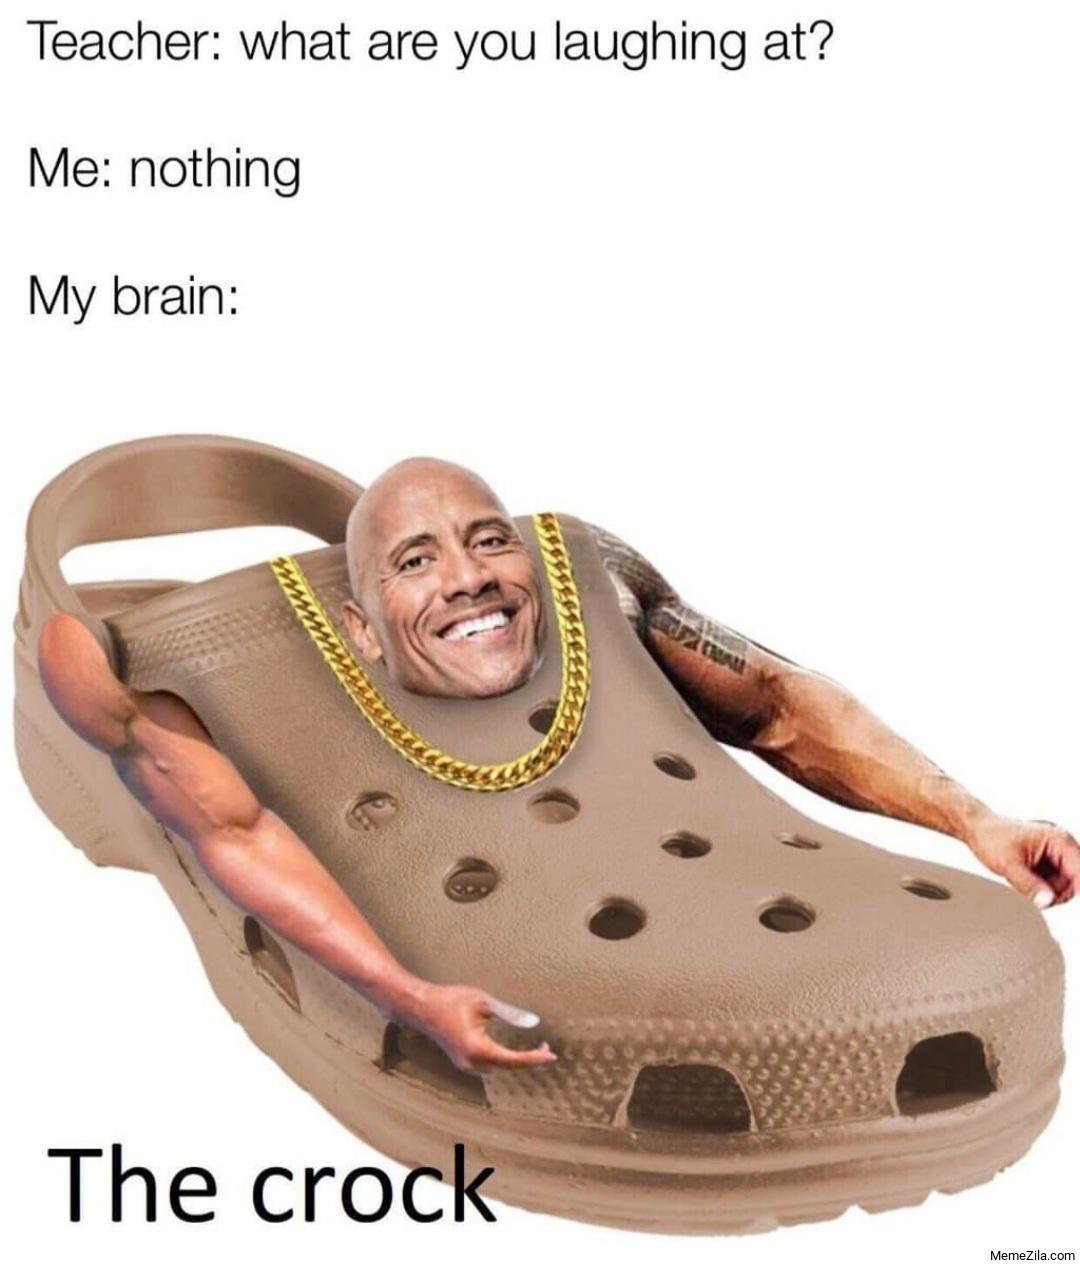 The Crock - meme